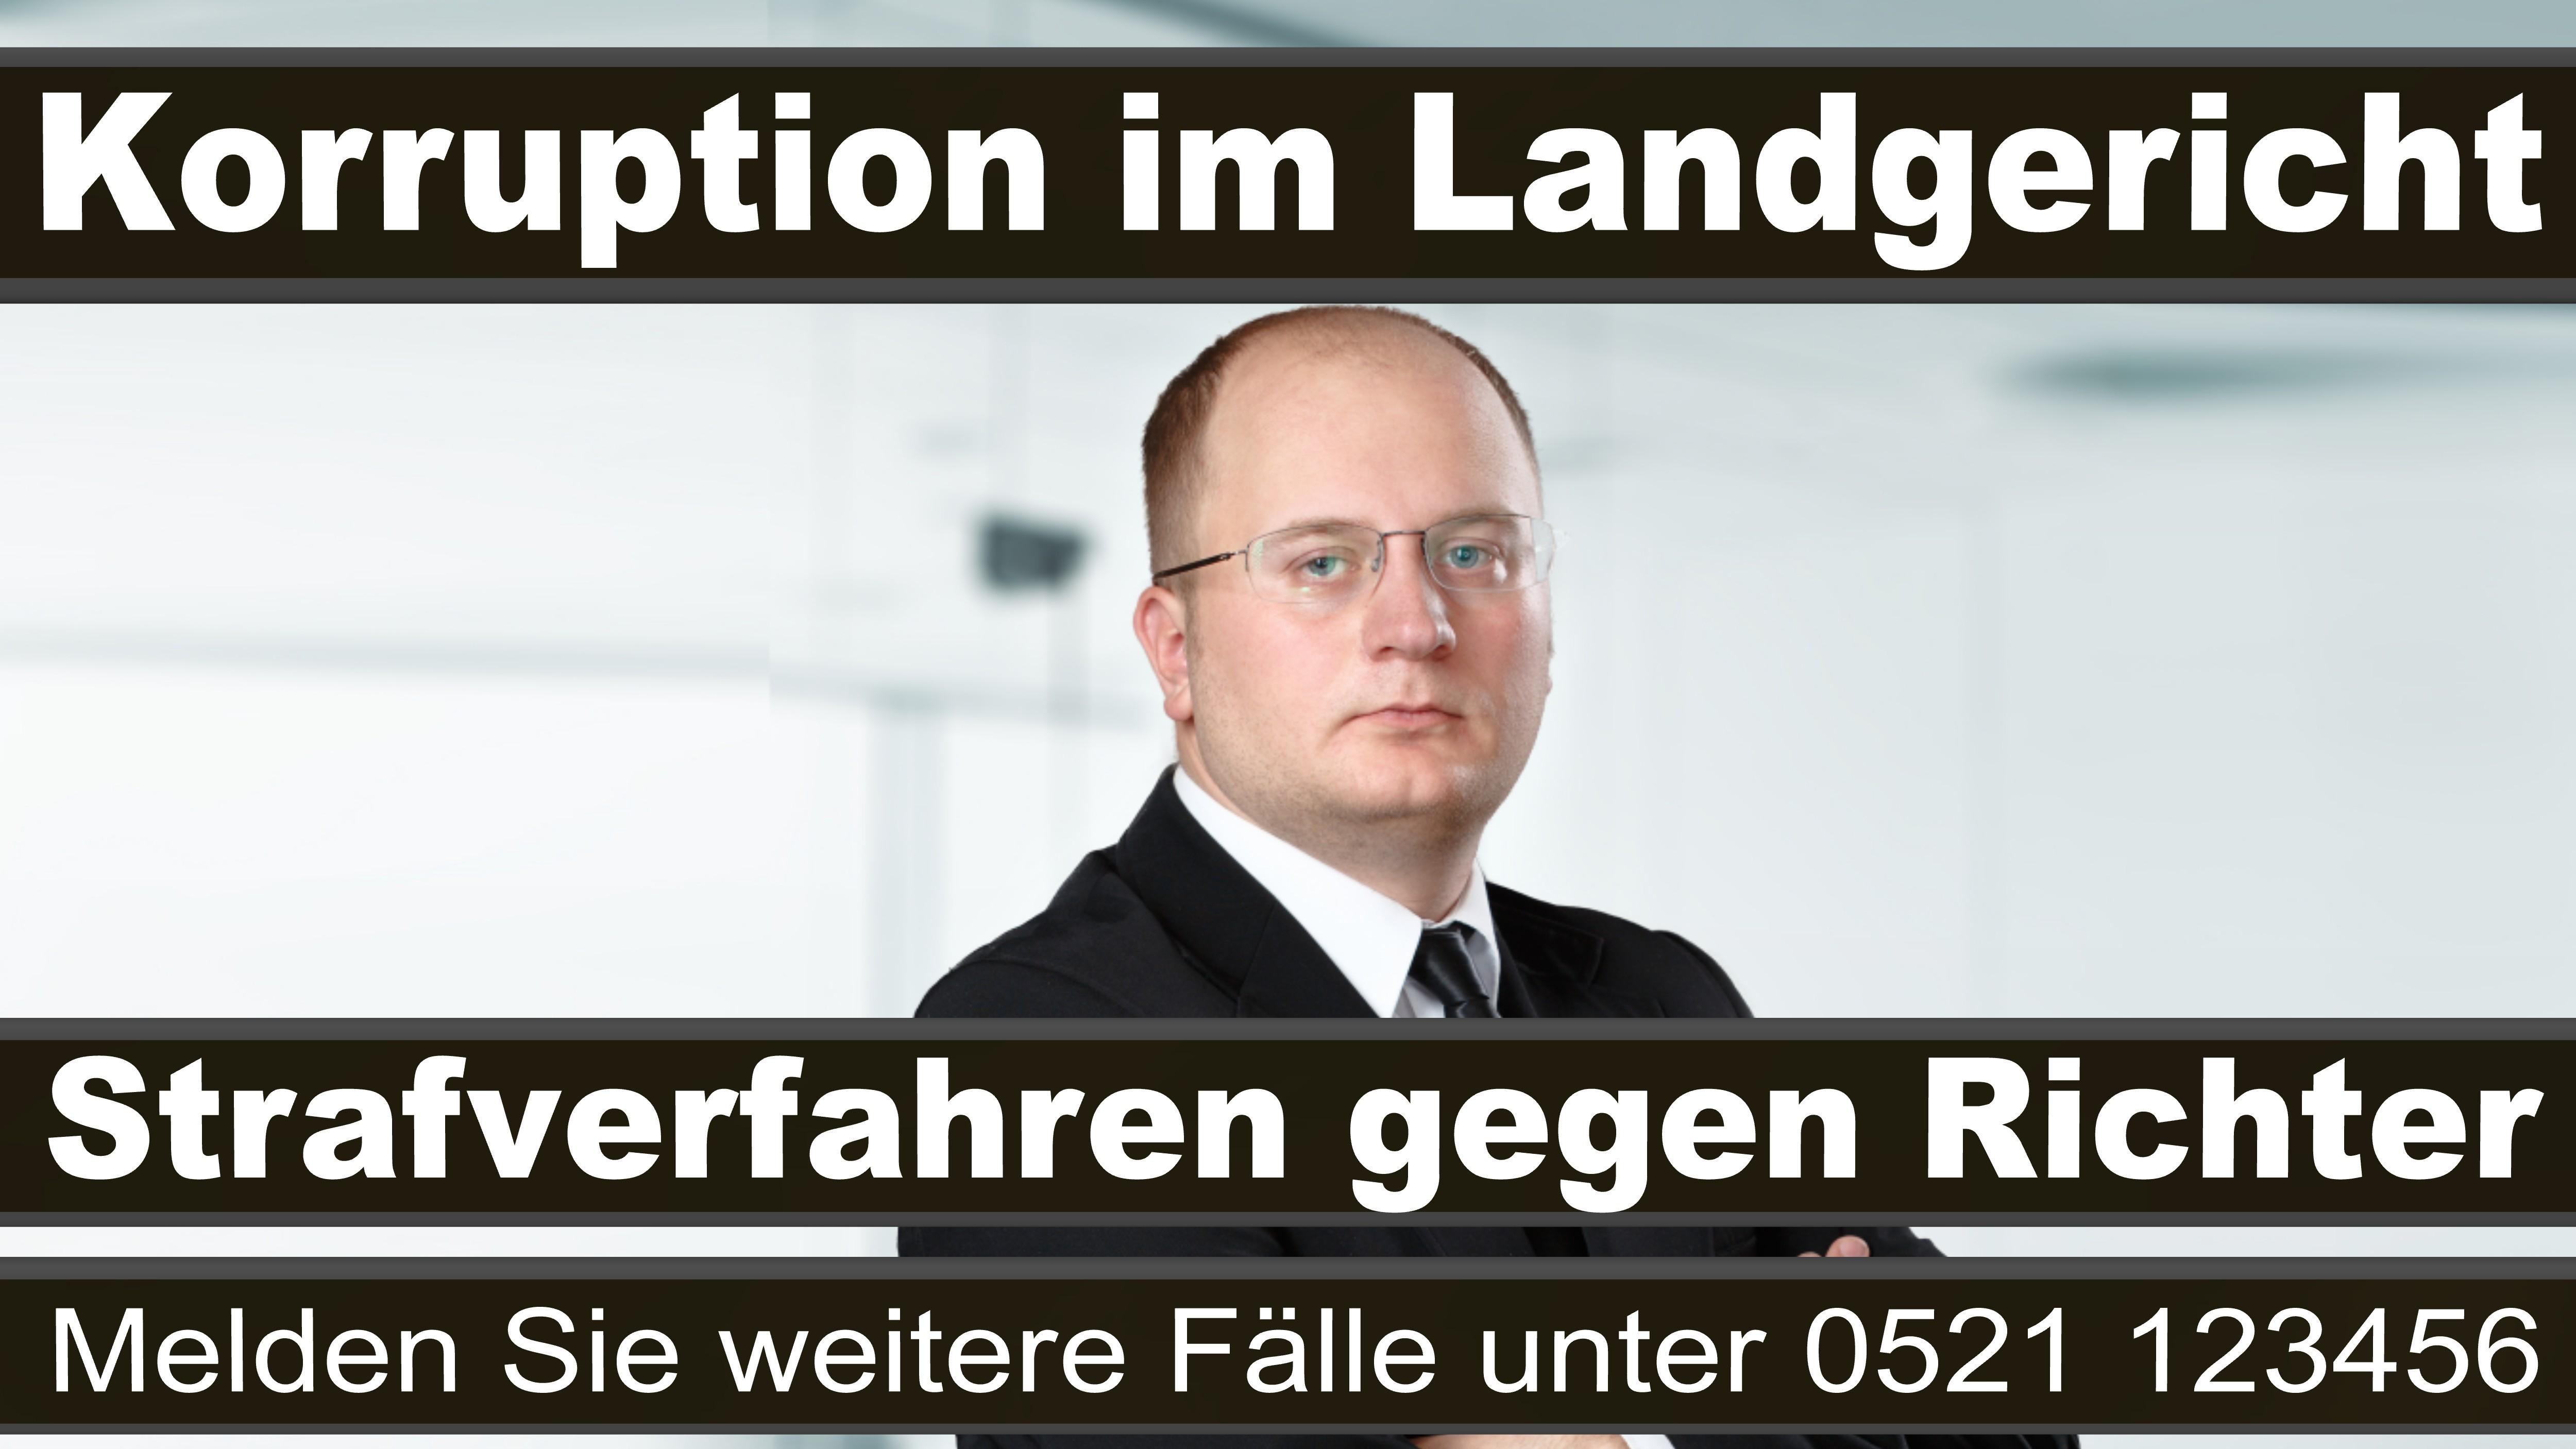 Korruption, Rechtsbeugung, Parteiverrat, Rechtsanwalt, Justiz, Präsident, Direktor, Leitender Oberstaatsanwalt, Verwaltungsgericht Oldenburg